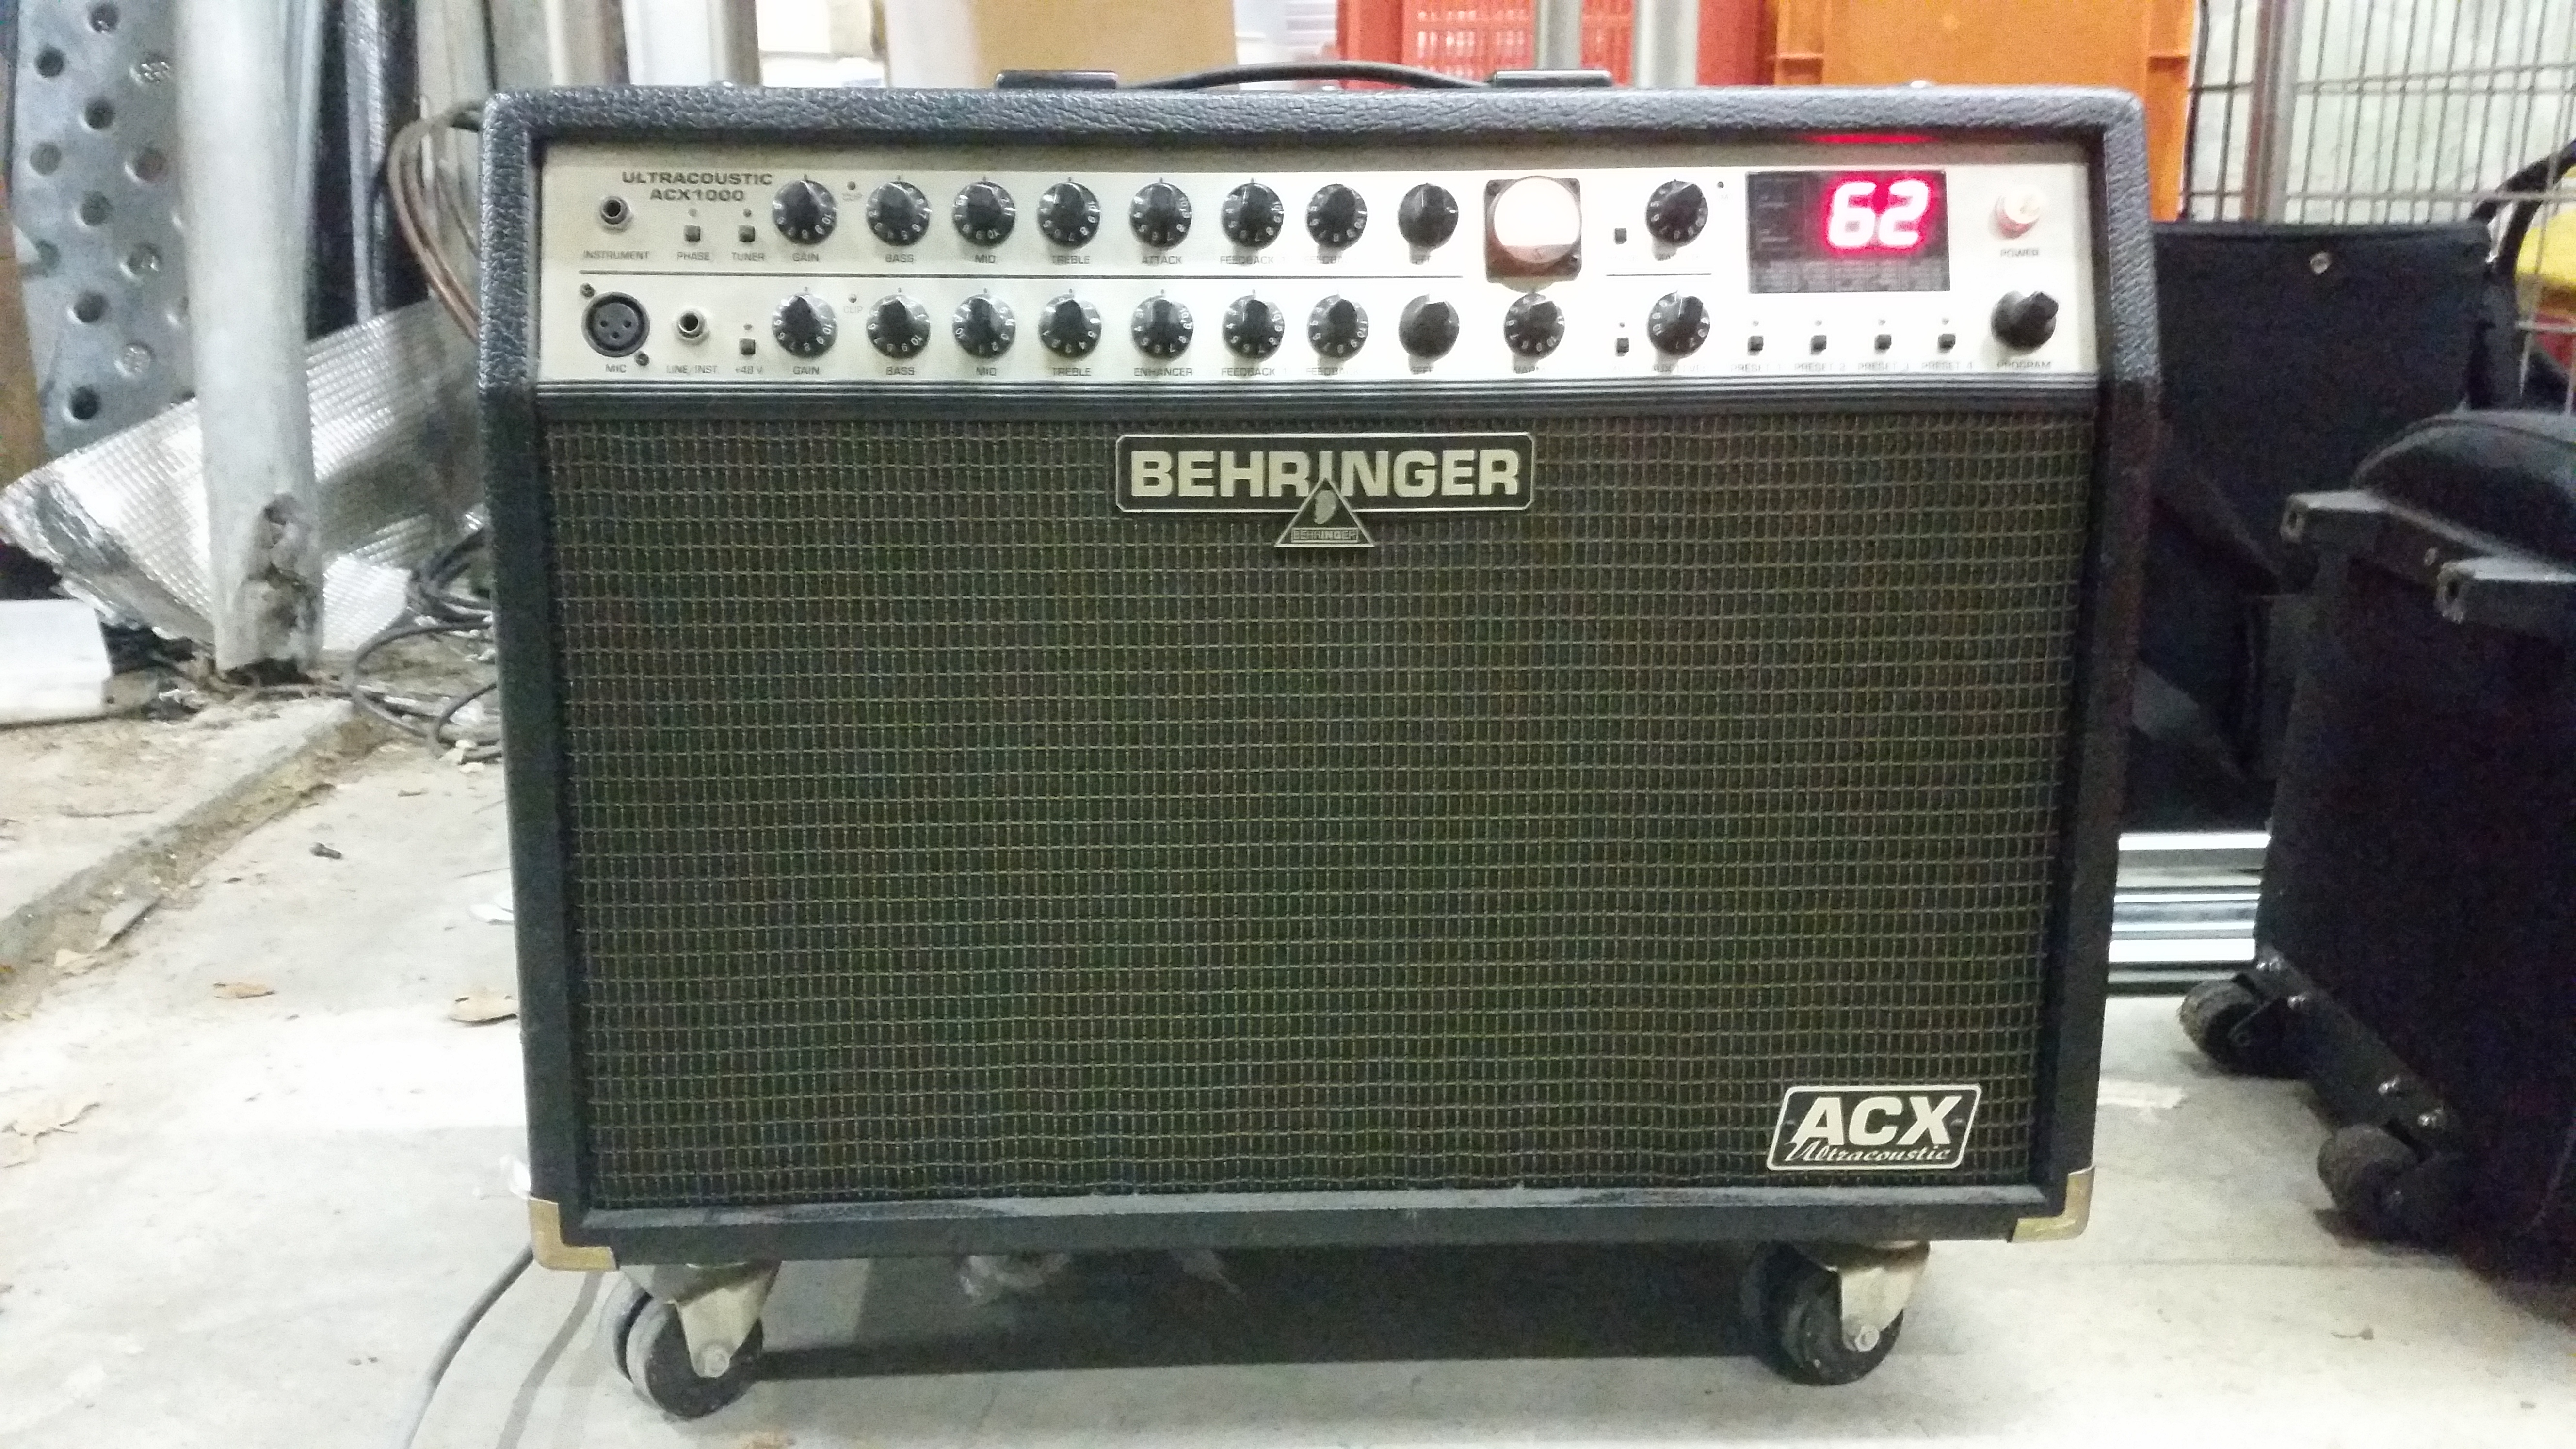 ampli guitare acoustique voix behringer acx 1000. Black Bedroom Furniture Sets. Home Design Ideas